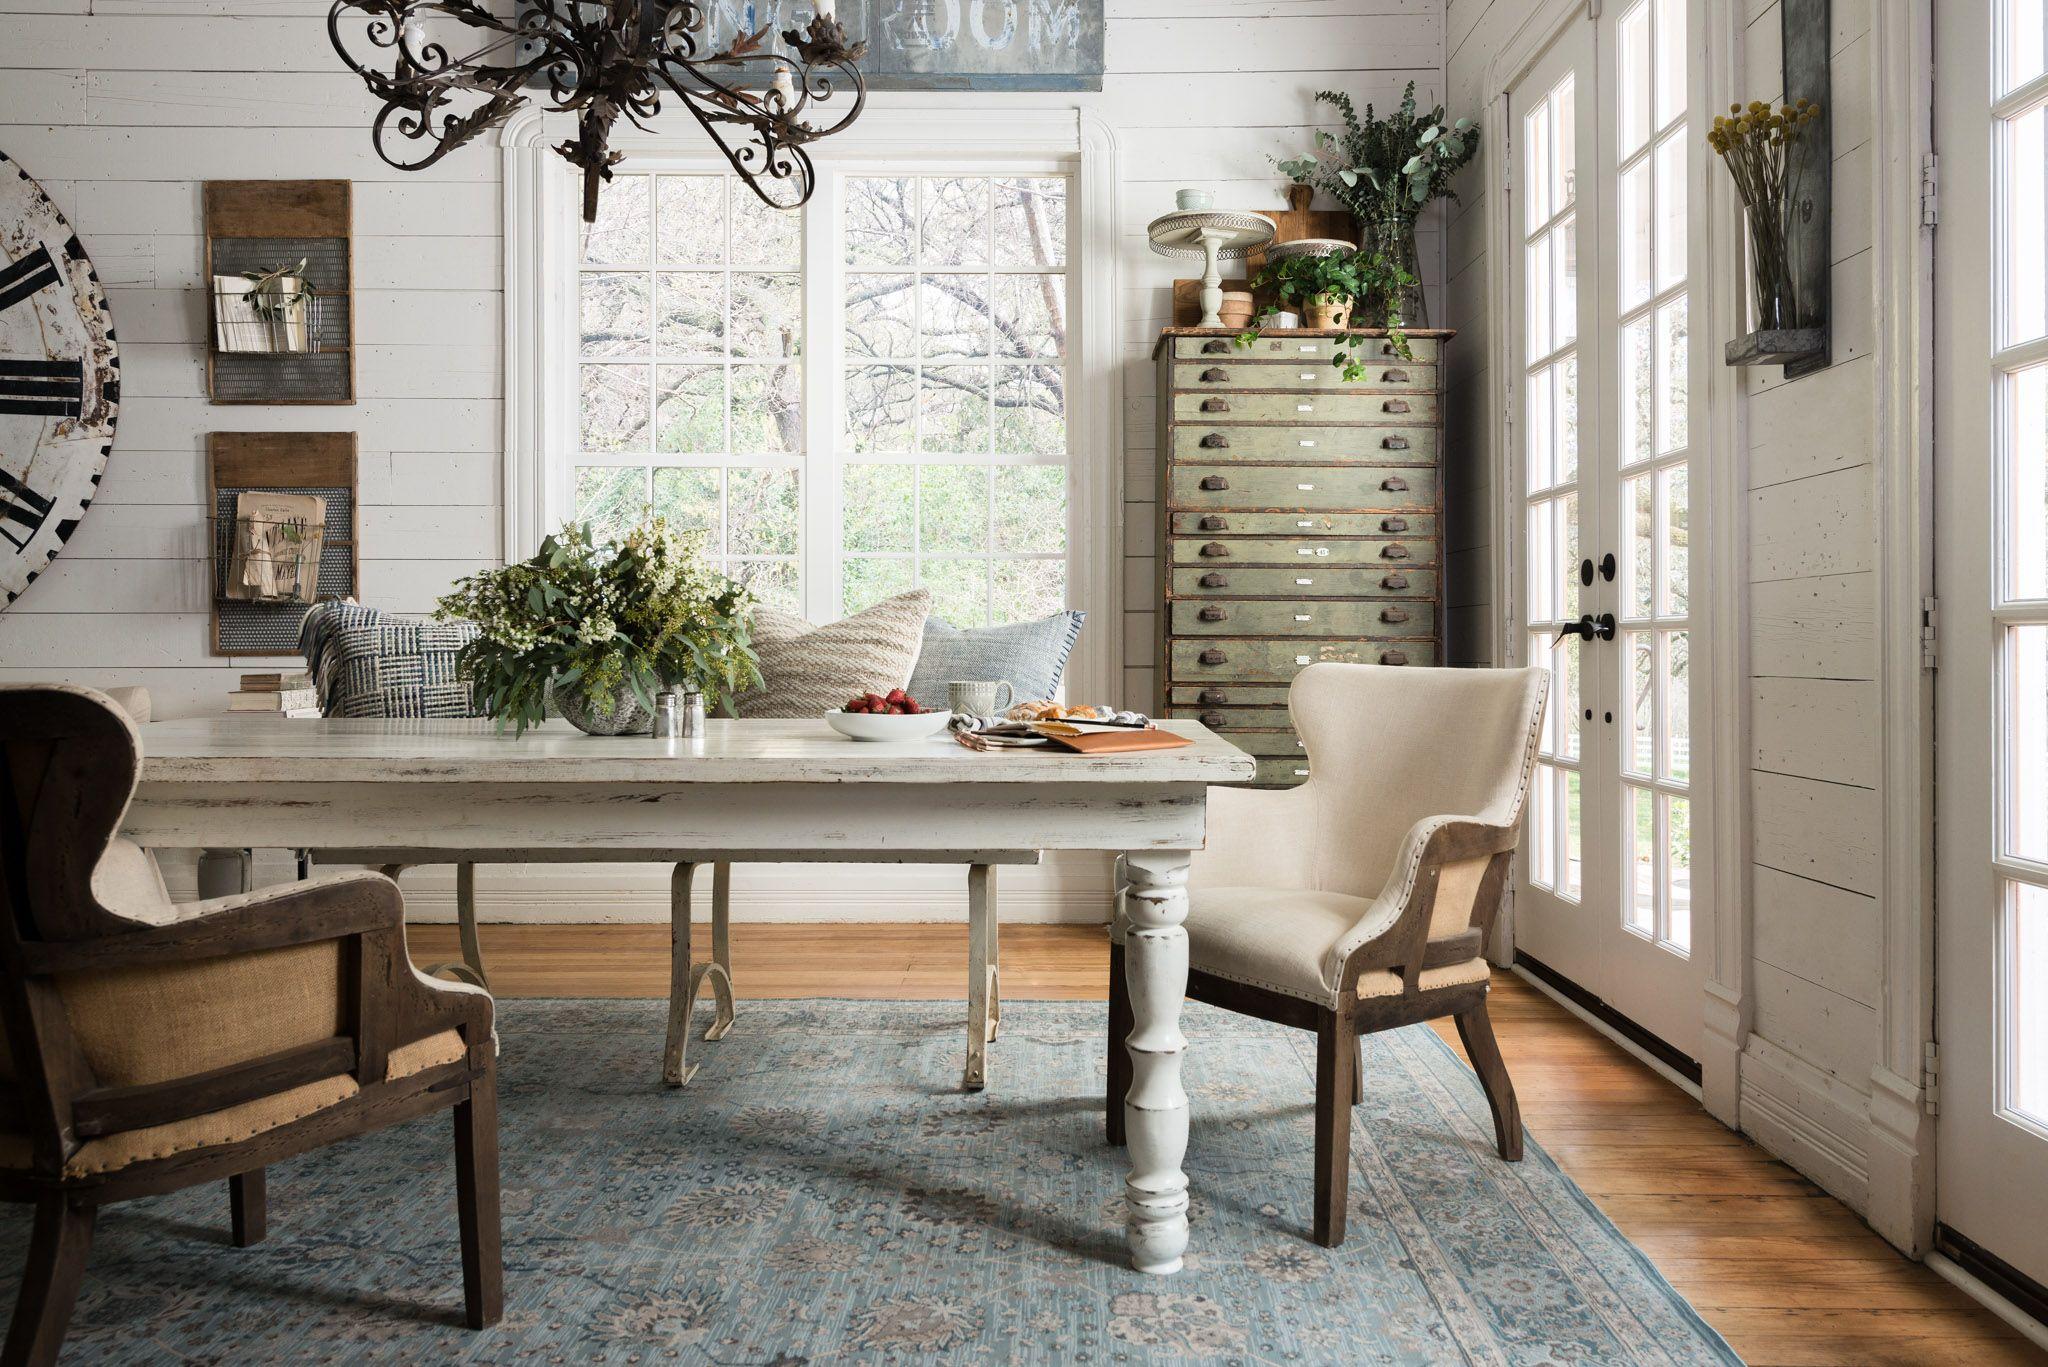 Magnolia Home Decor joanna gaines' dining room featuring the magnolia home ella rose